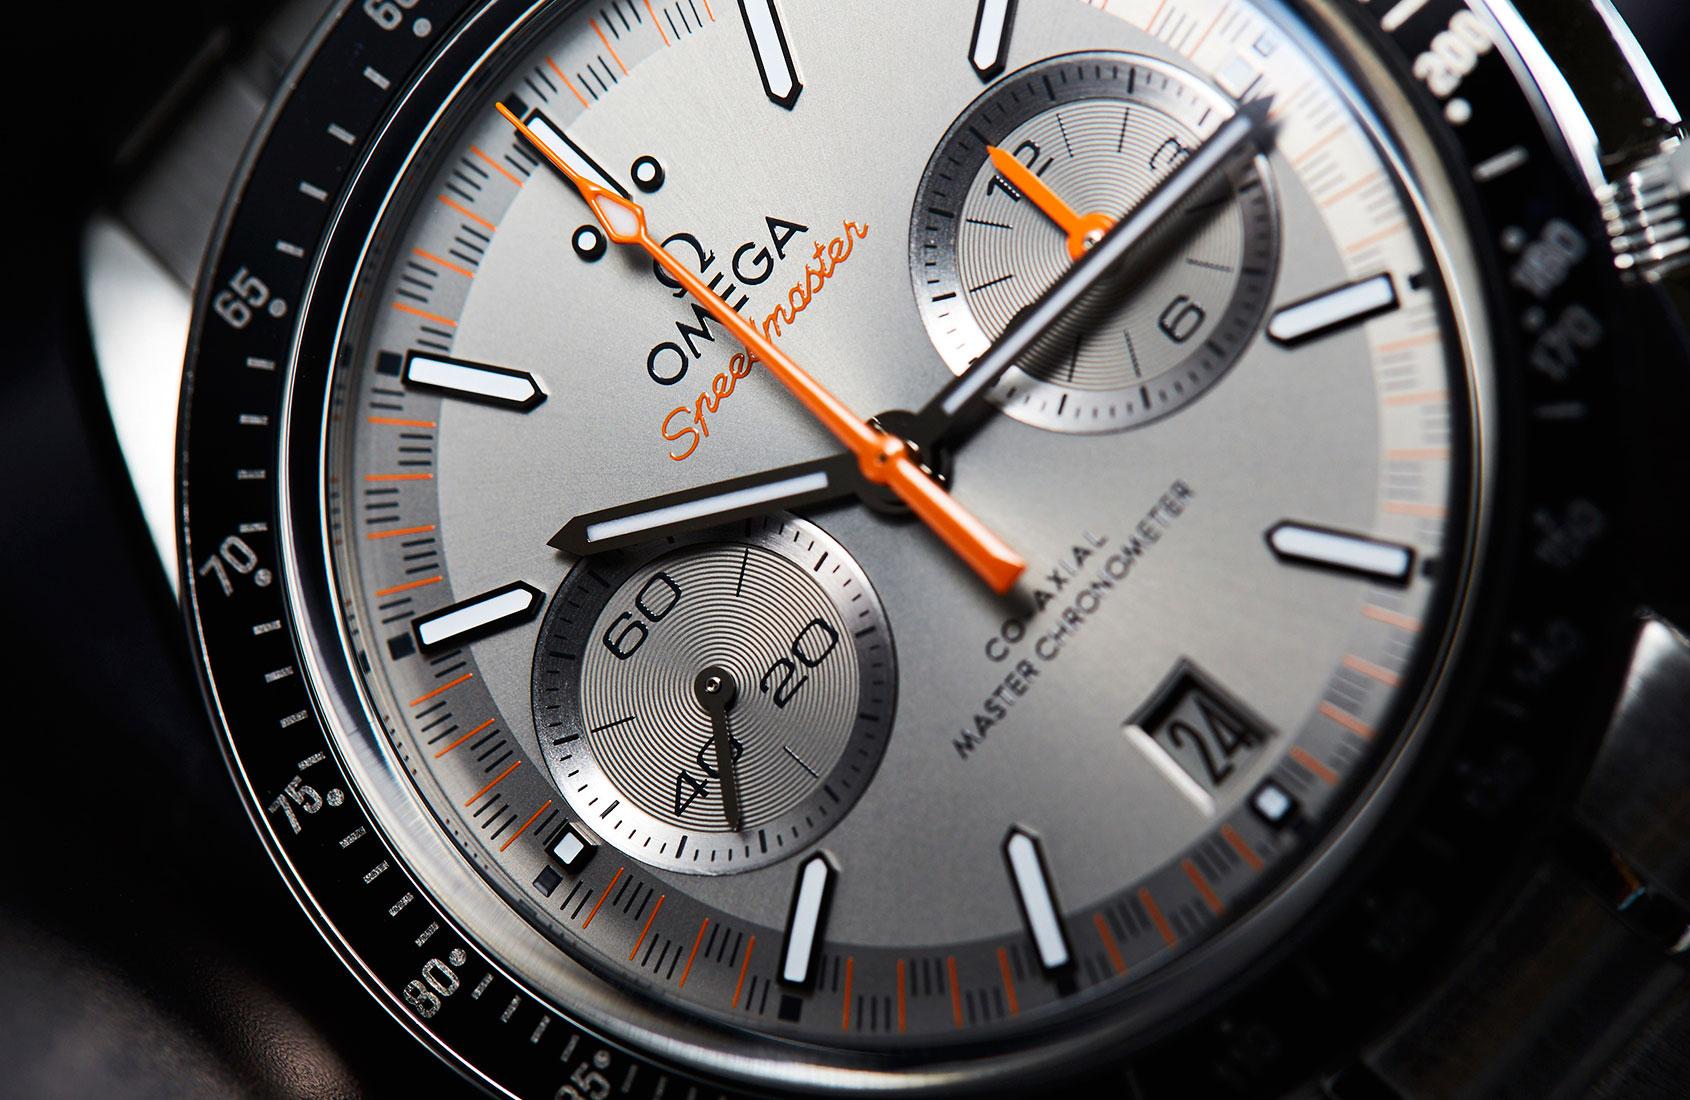 Dialled in for speed – the Omega Speedmaster Racing Master Chronometer